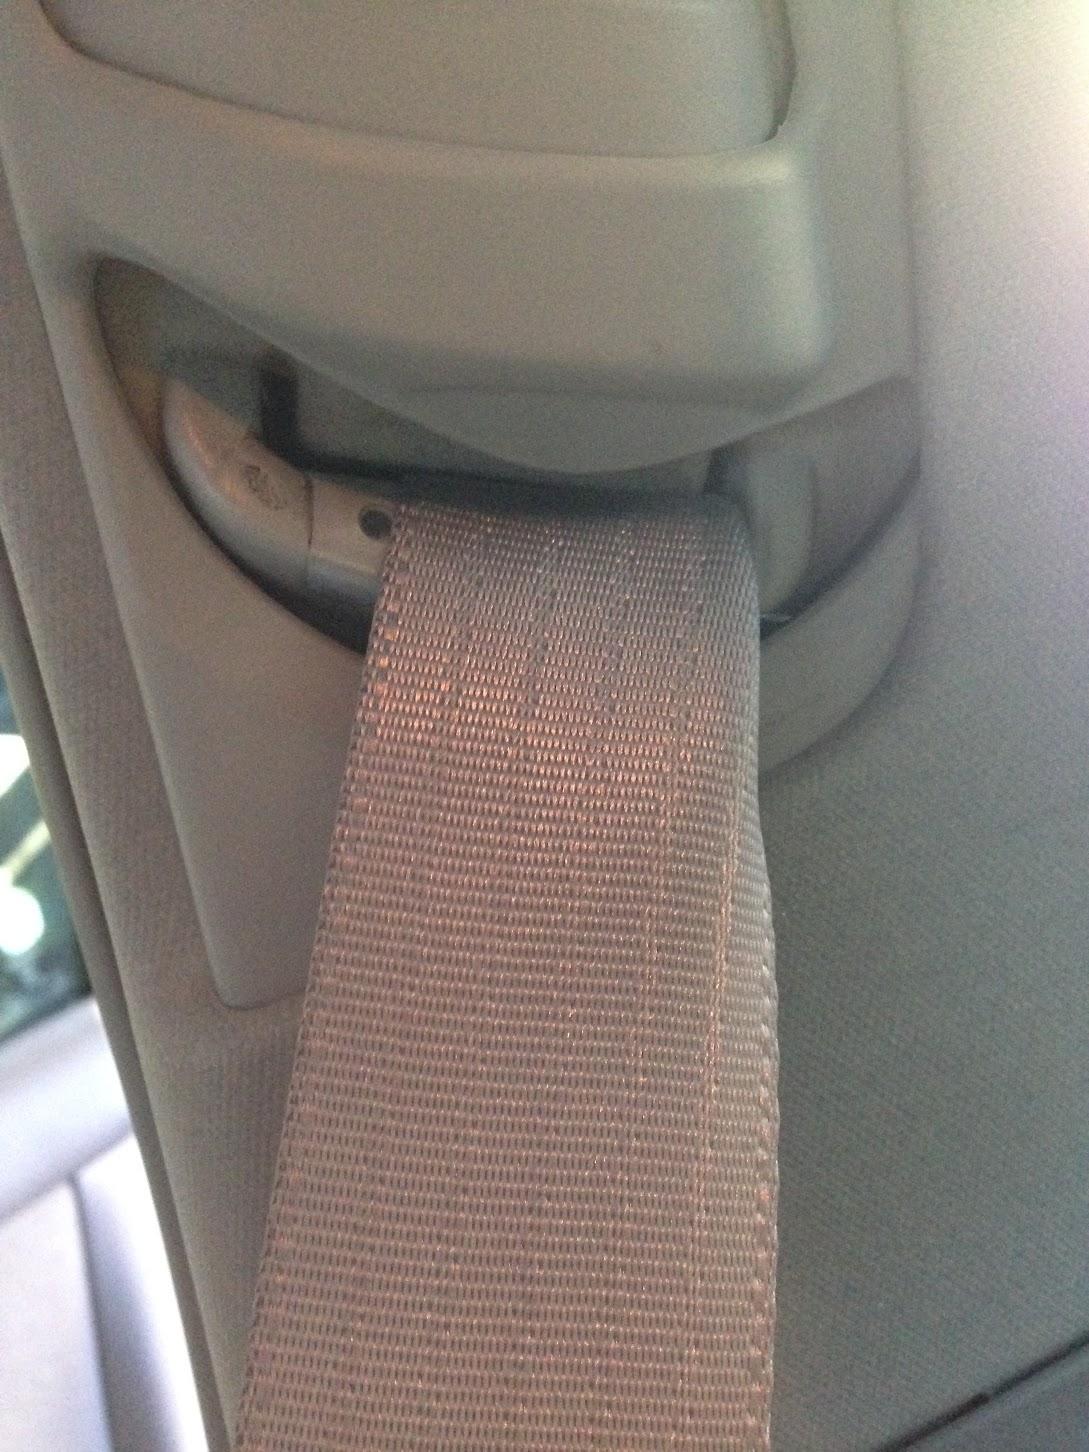 2006 Toyota Camry Passenger Seatbelt Twisted Internally Cartalk